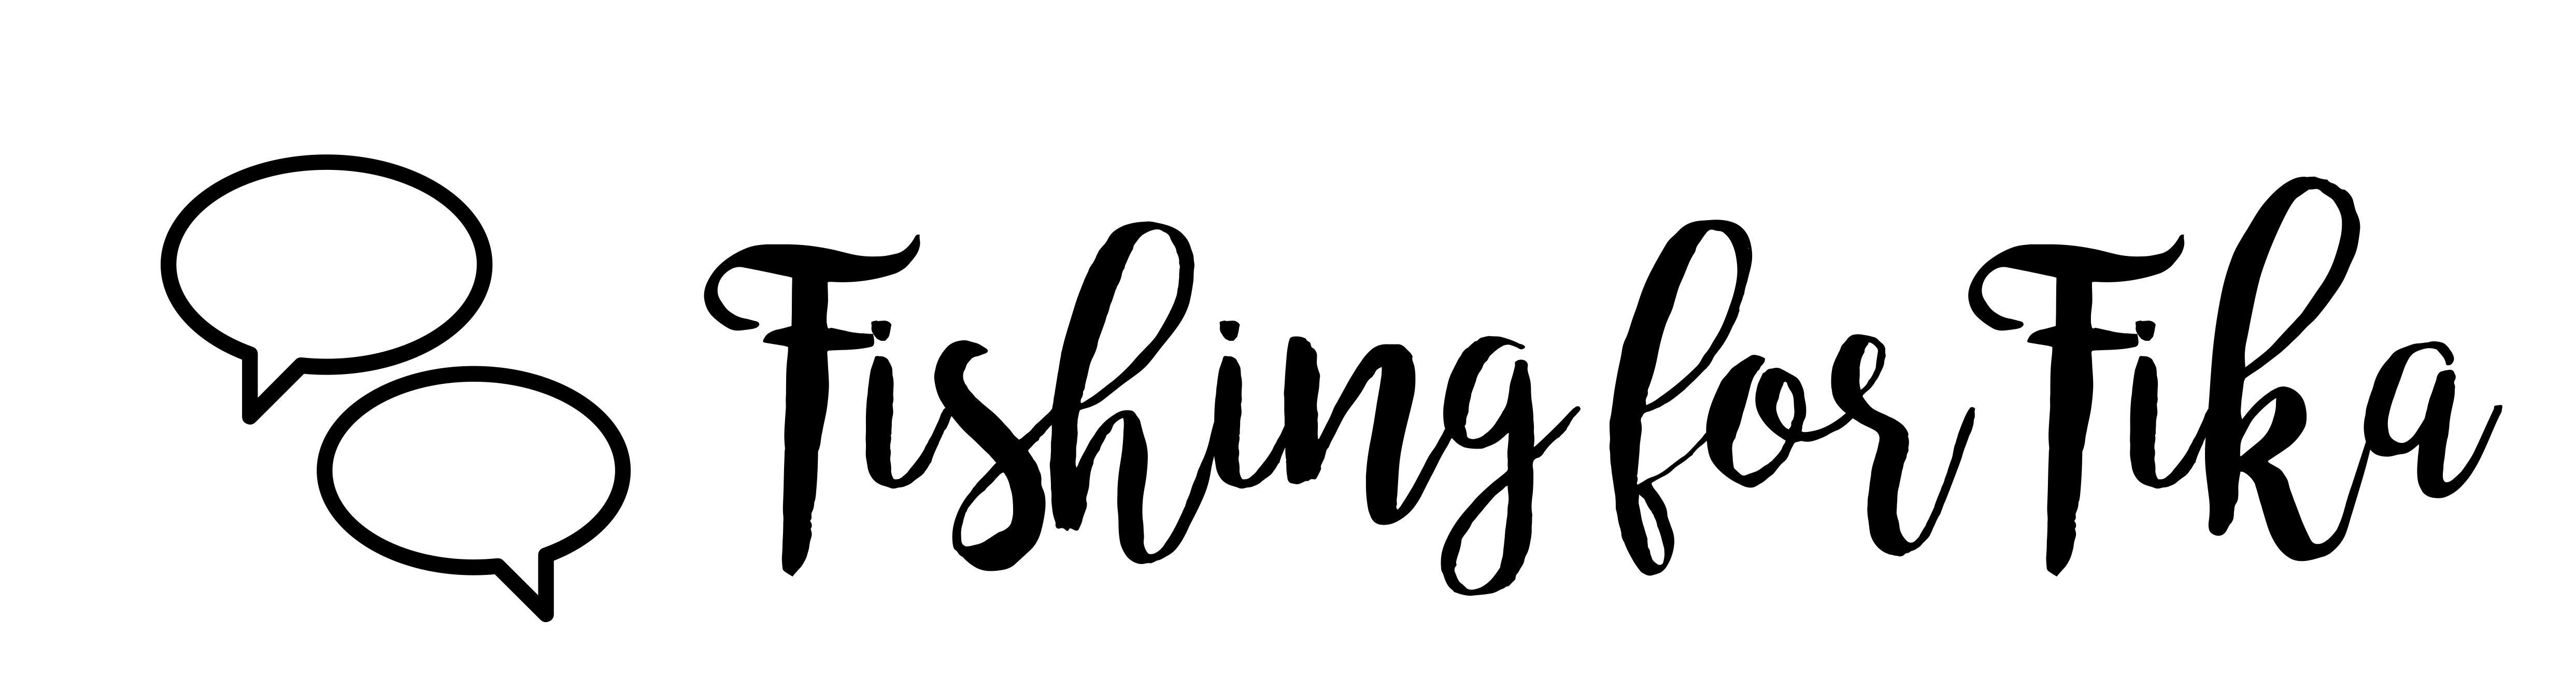 Fishing for Fika